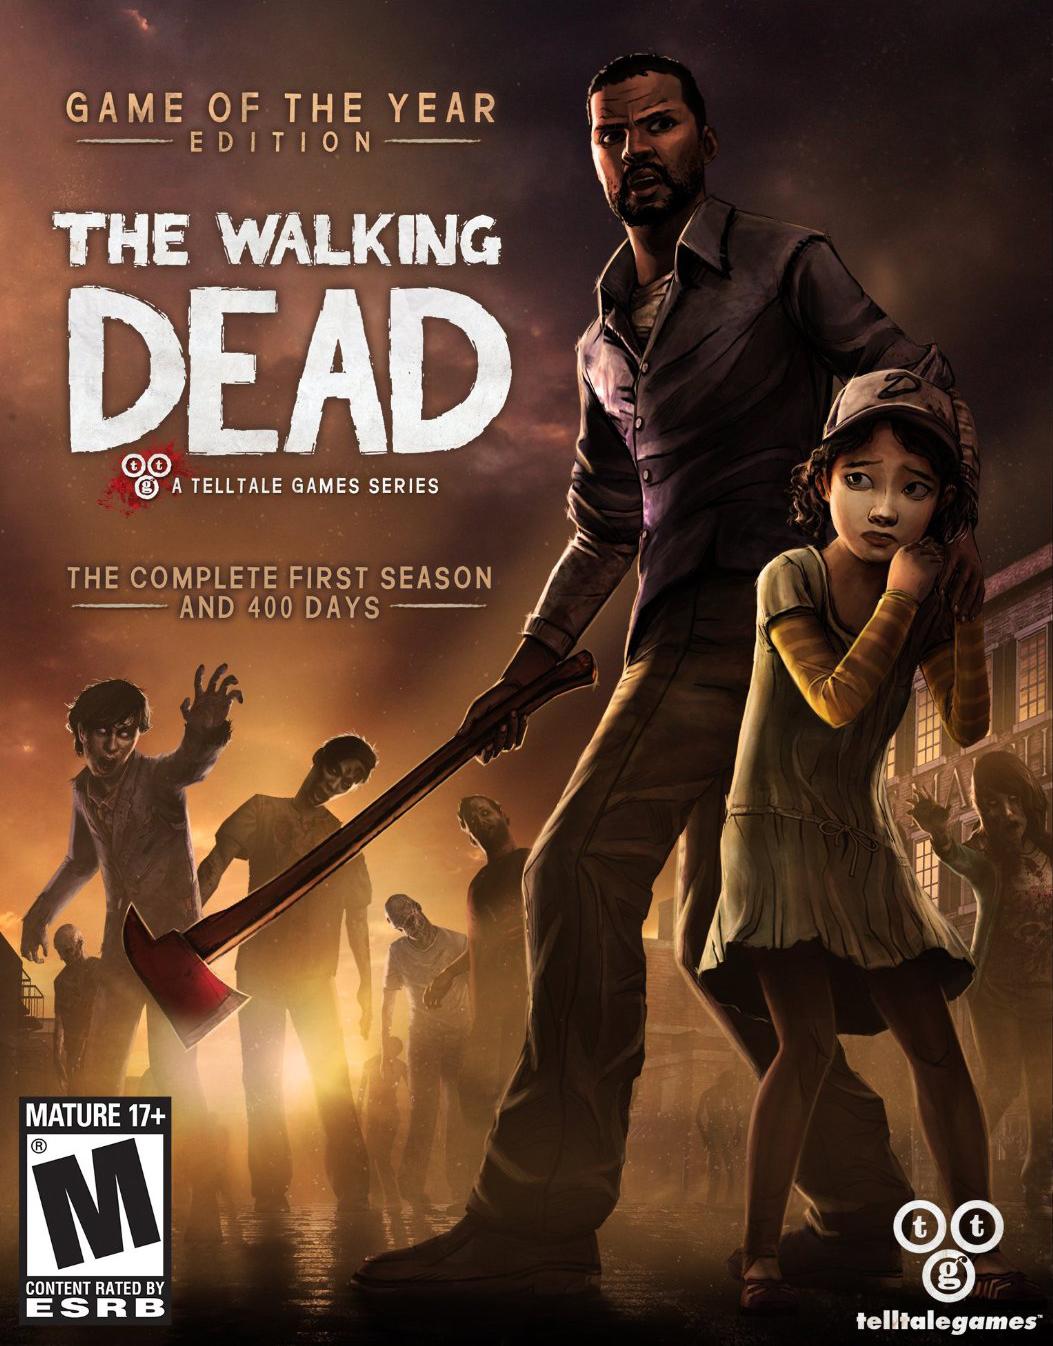 The Walking Dead Game, Season 1, 400 Days